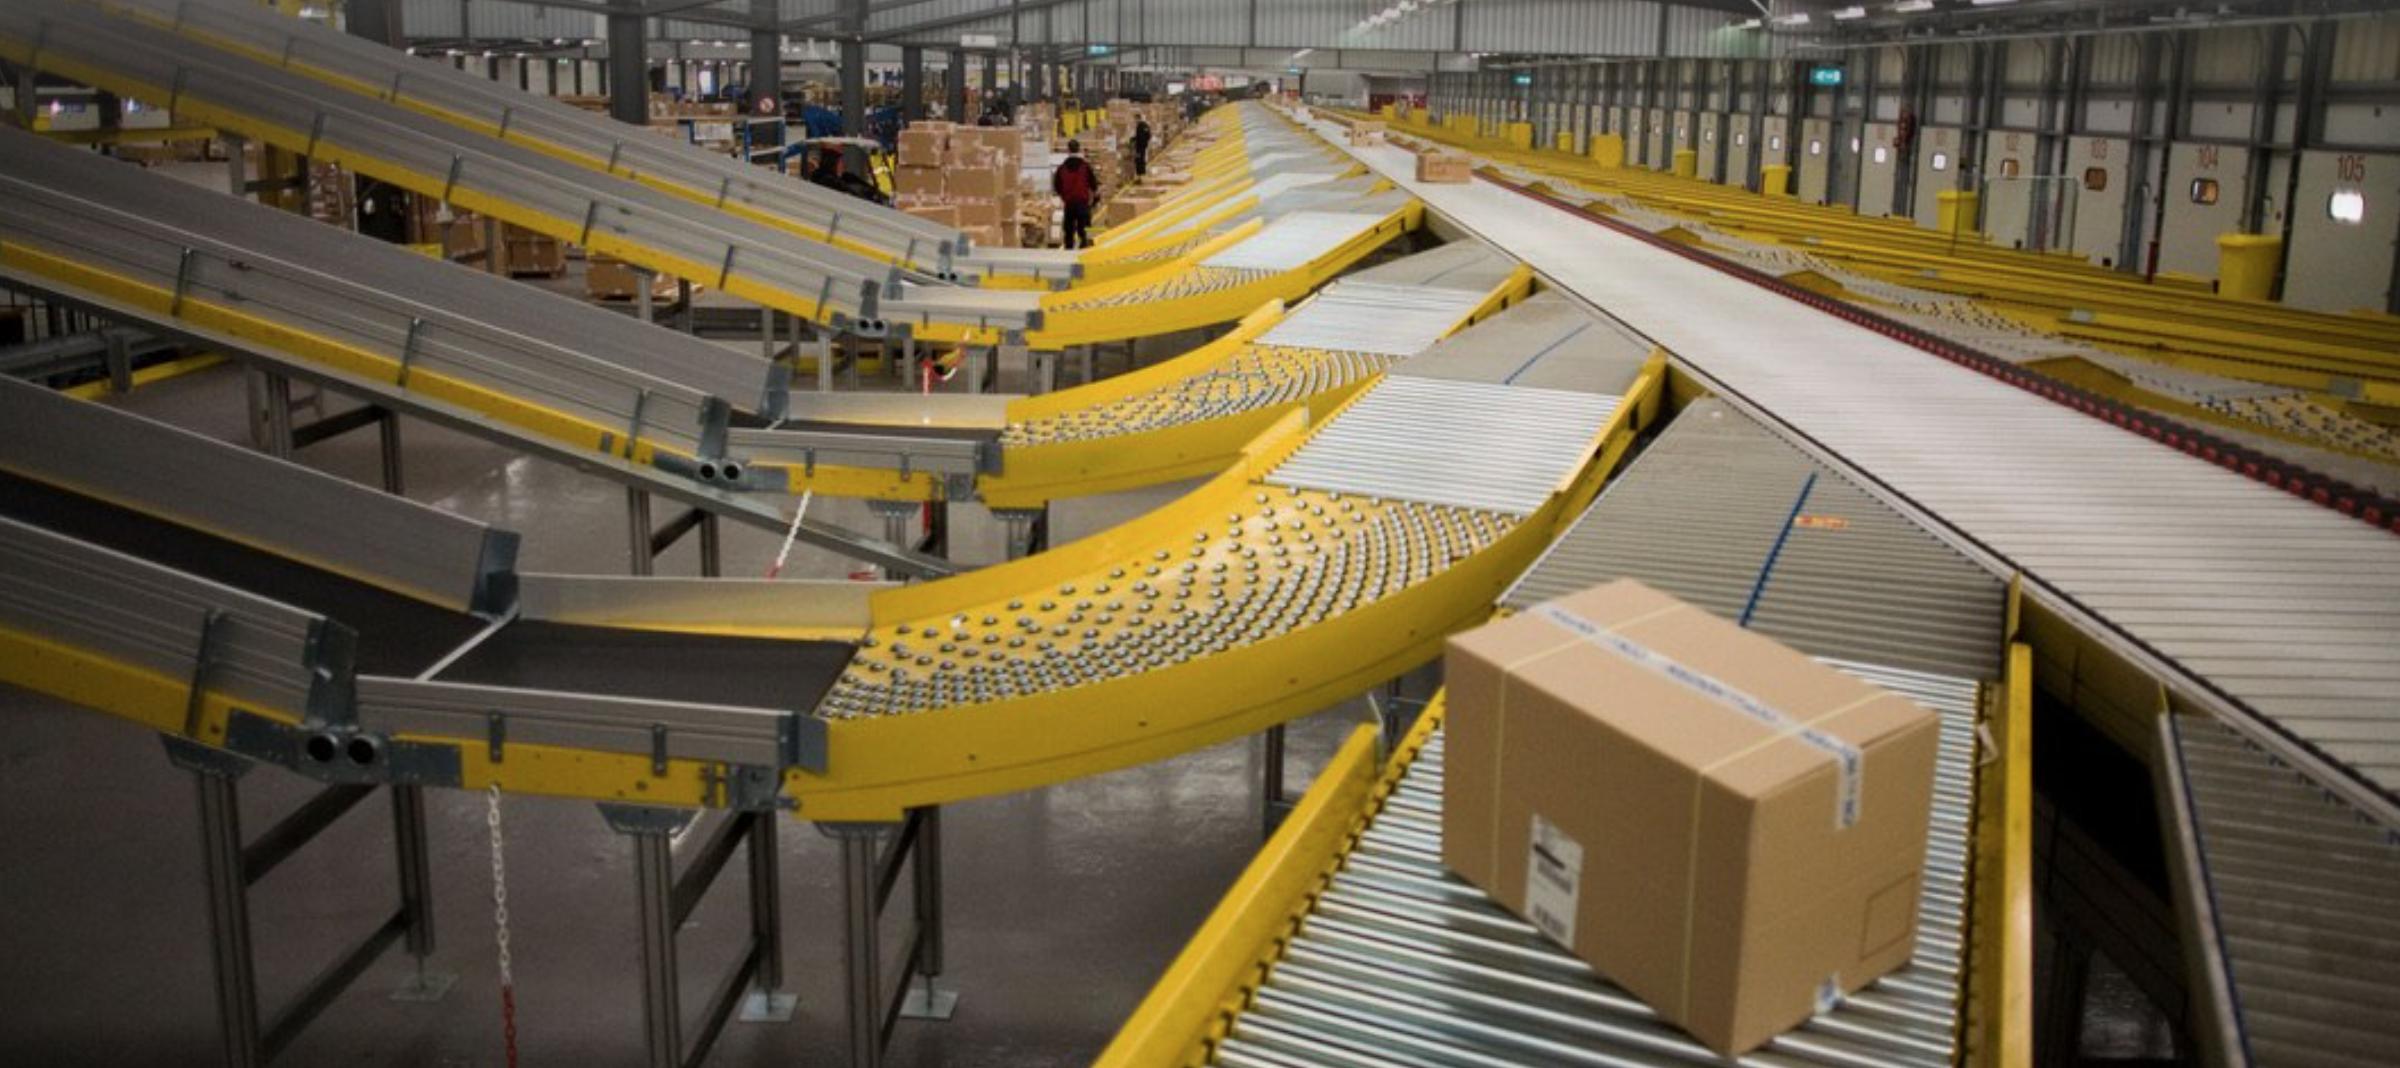 MHS conveyors pic